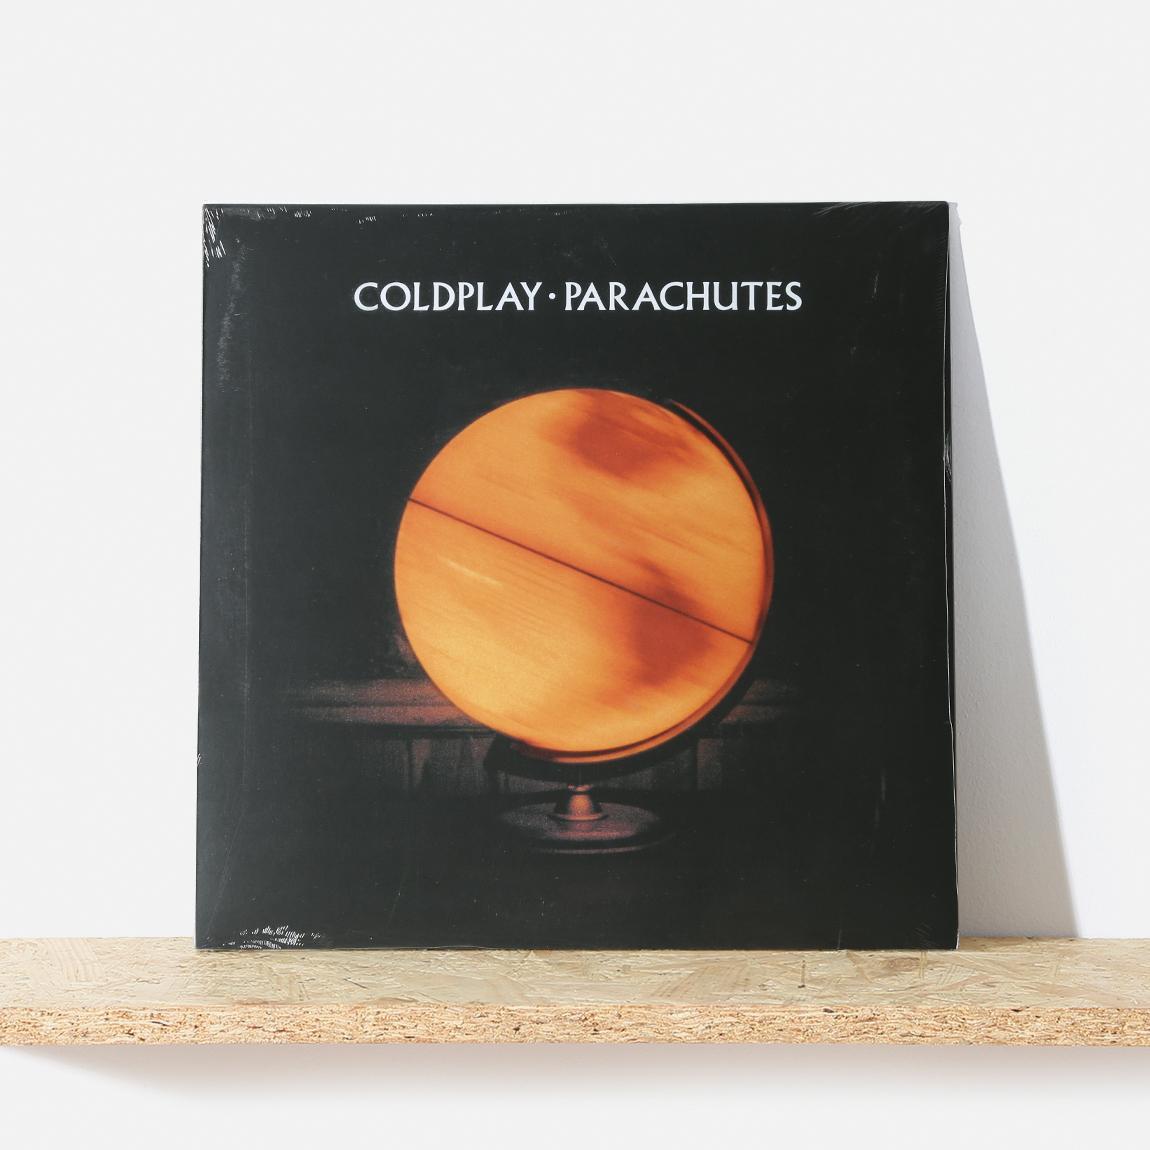 Parachutes Coldplay Audio